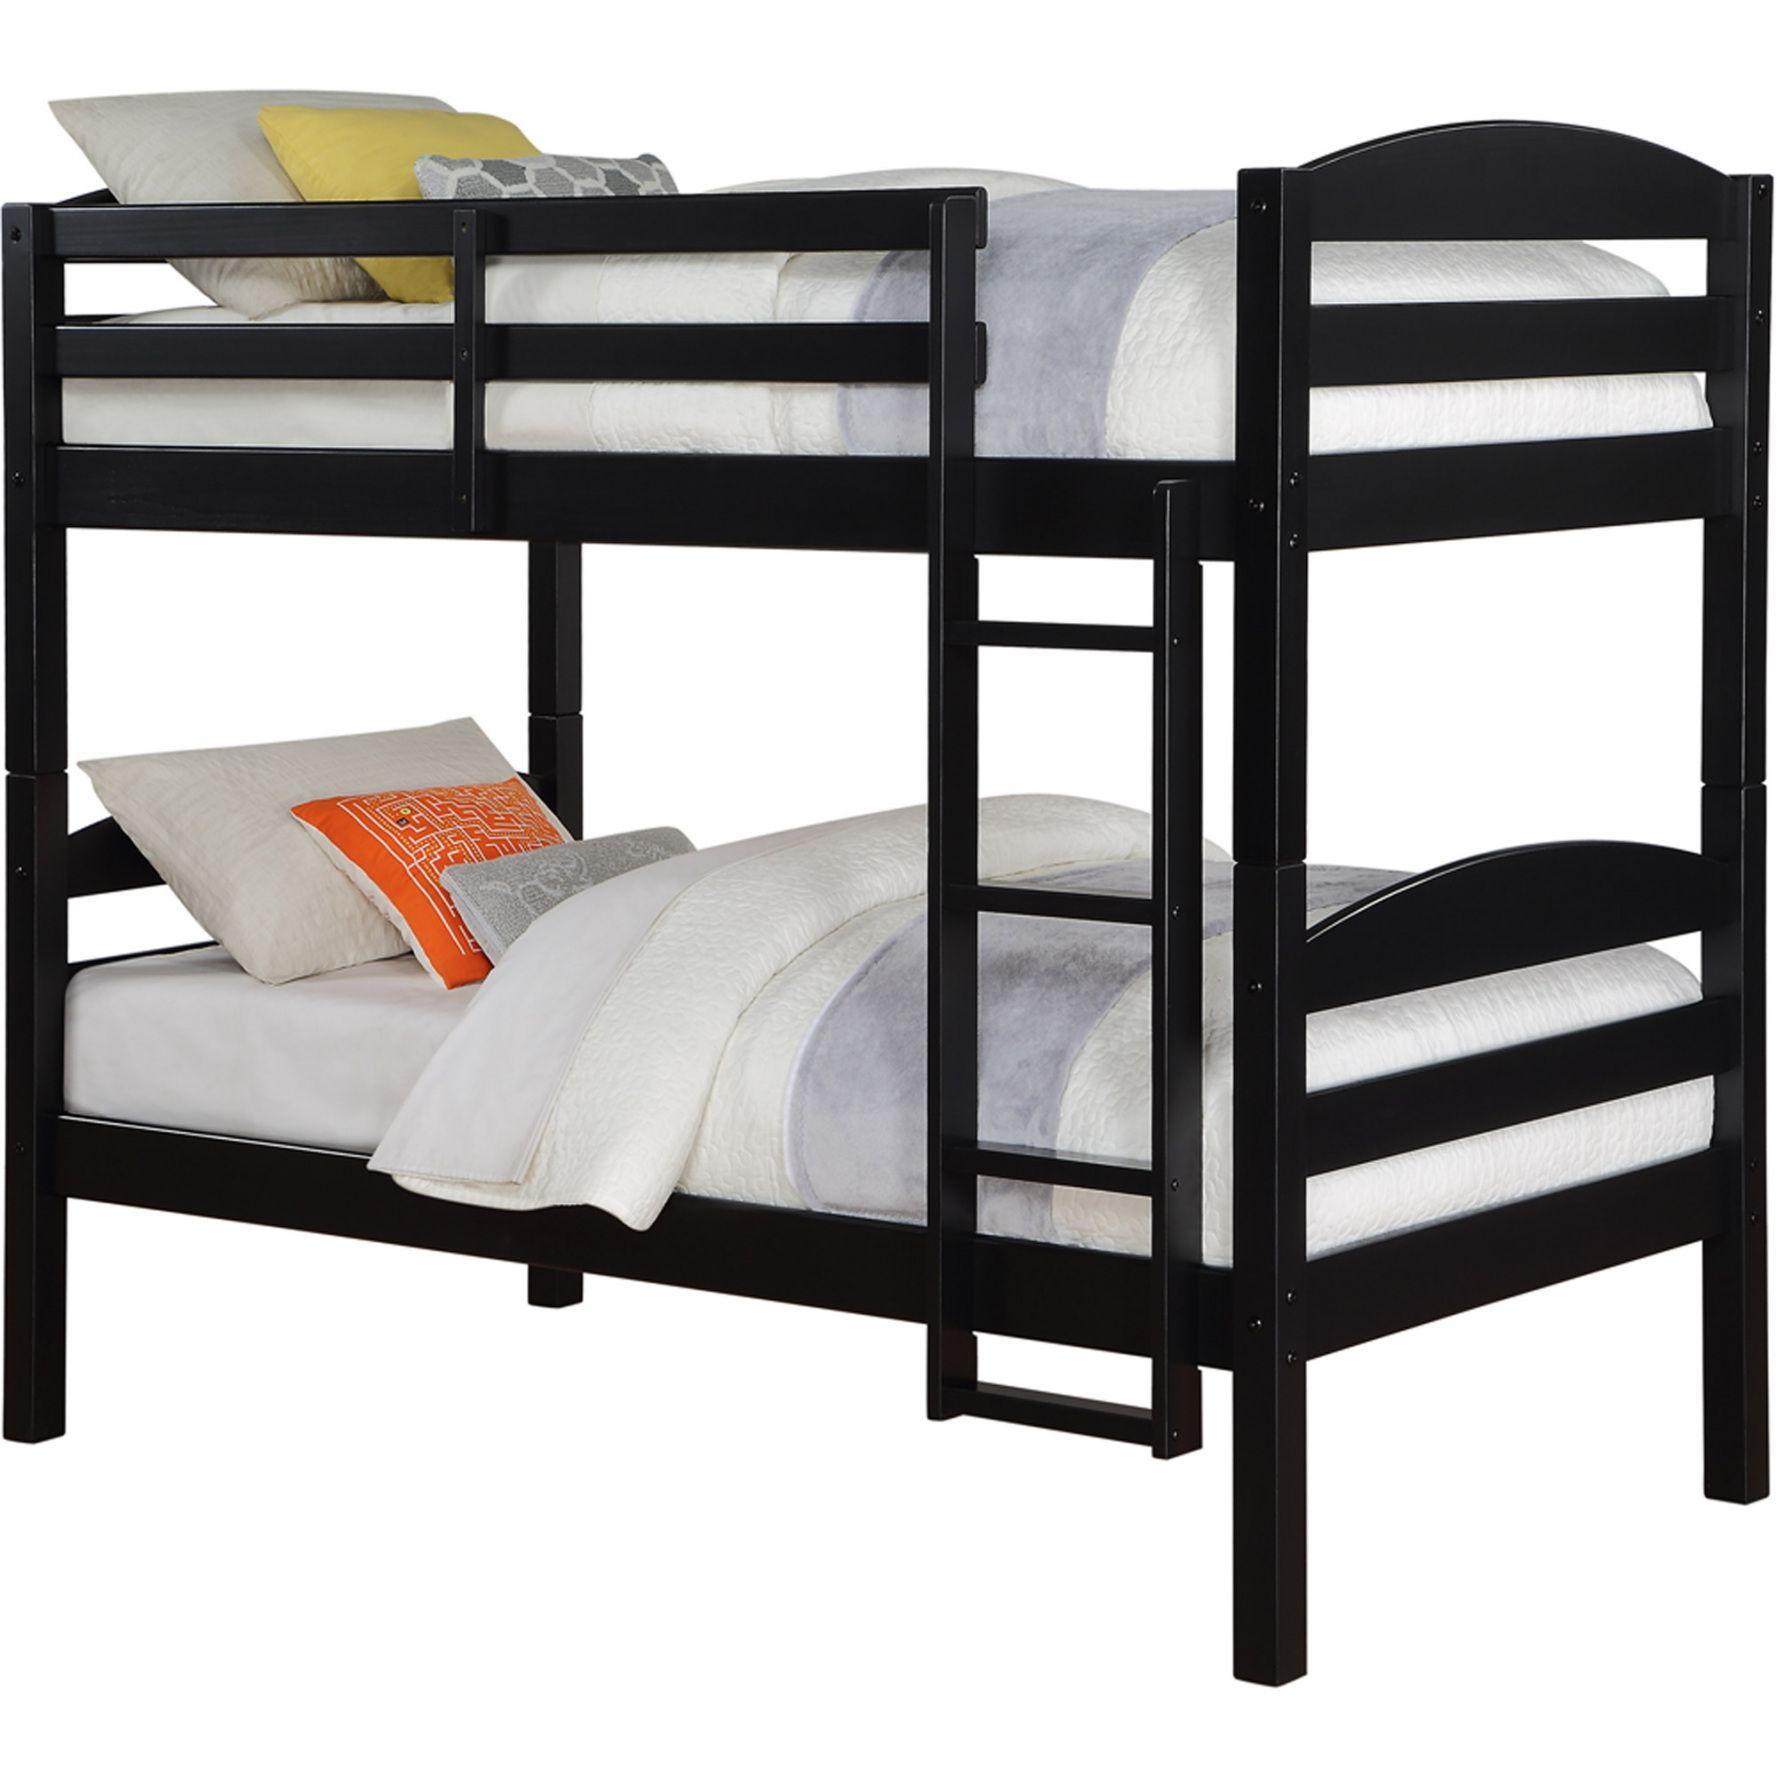 77 Bunk Bed Mattress Walmart Interior Bedroom Design Furniture